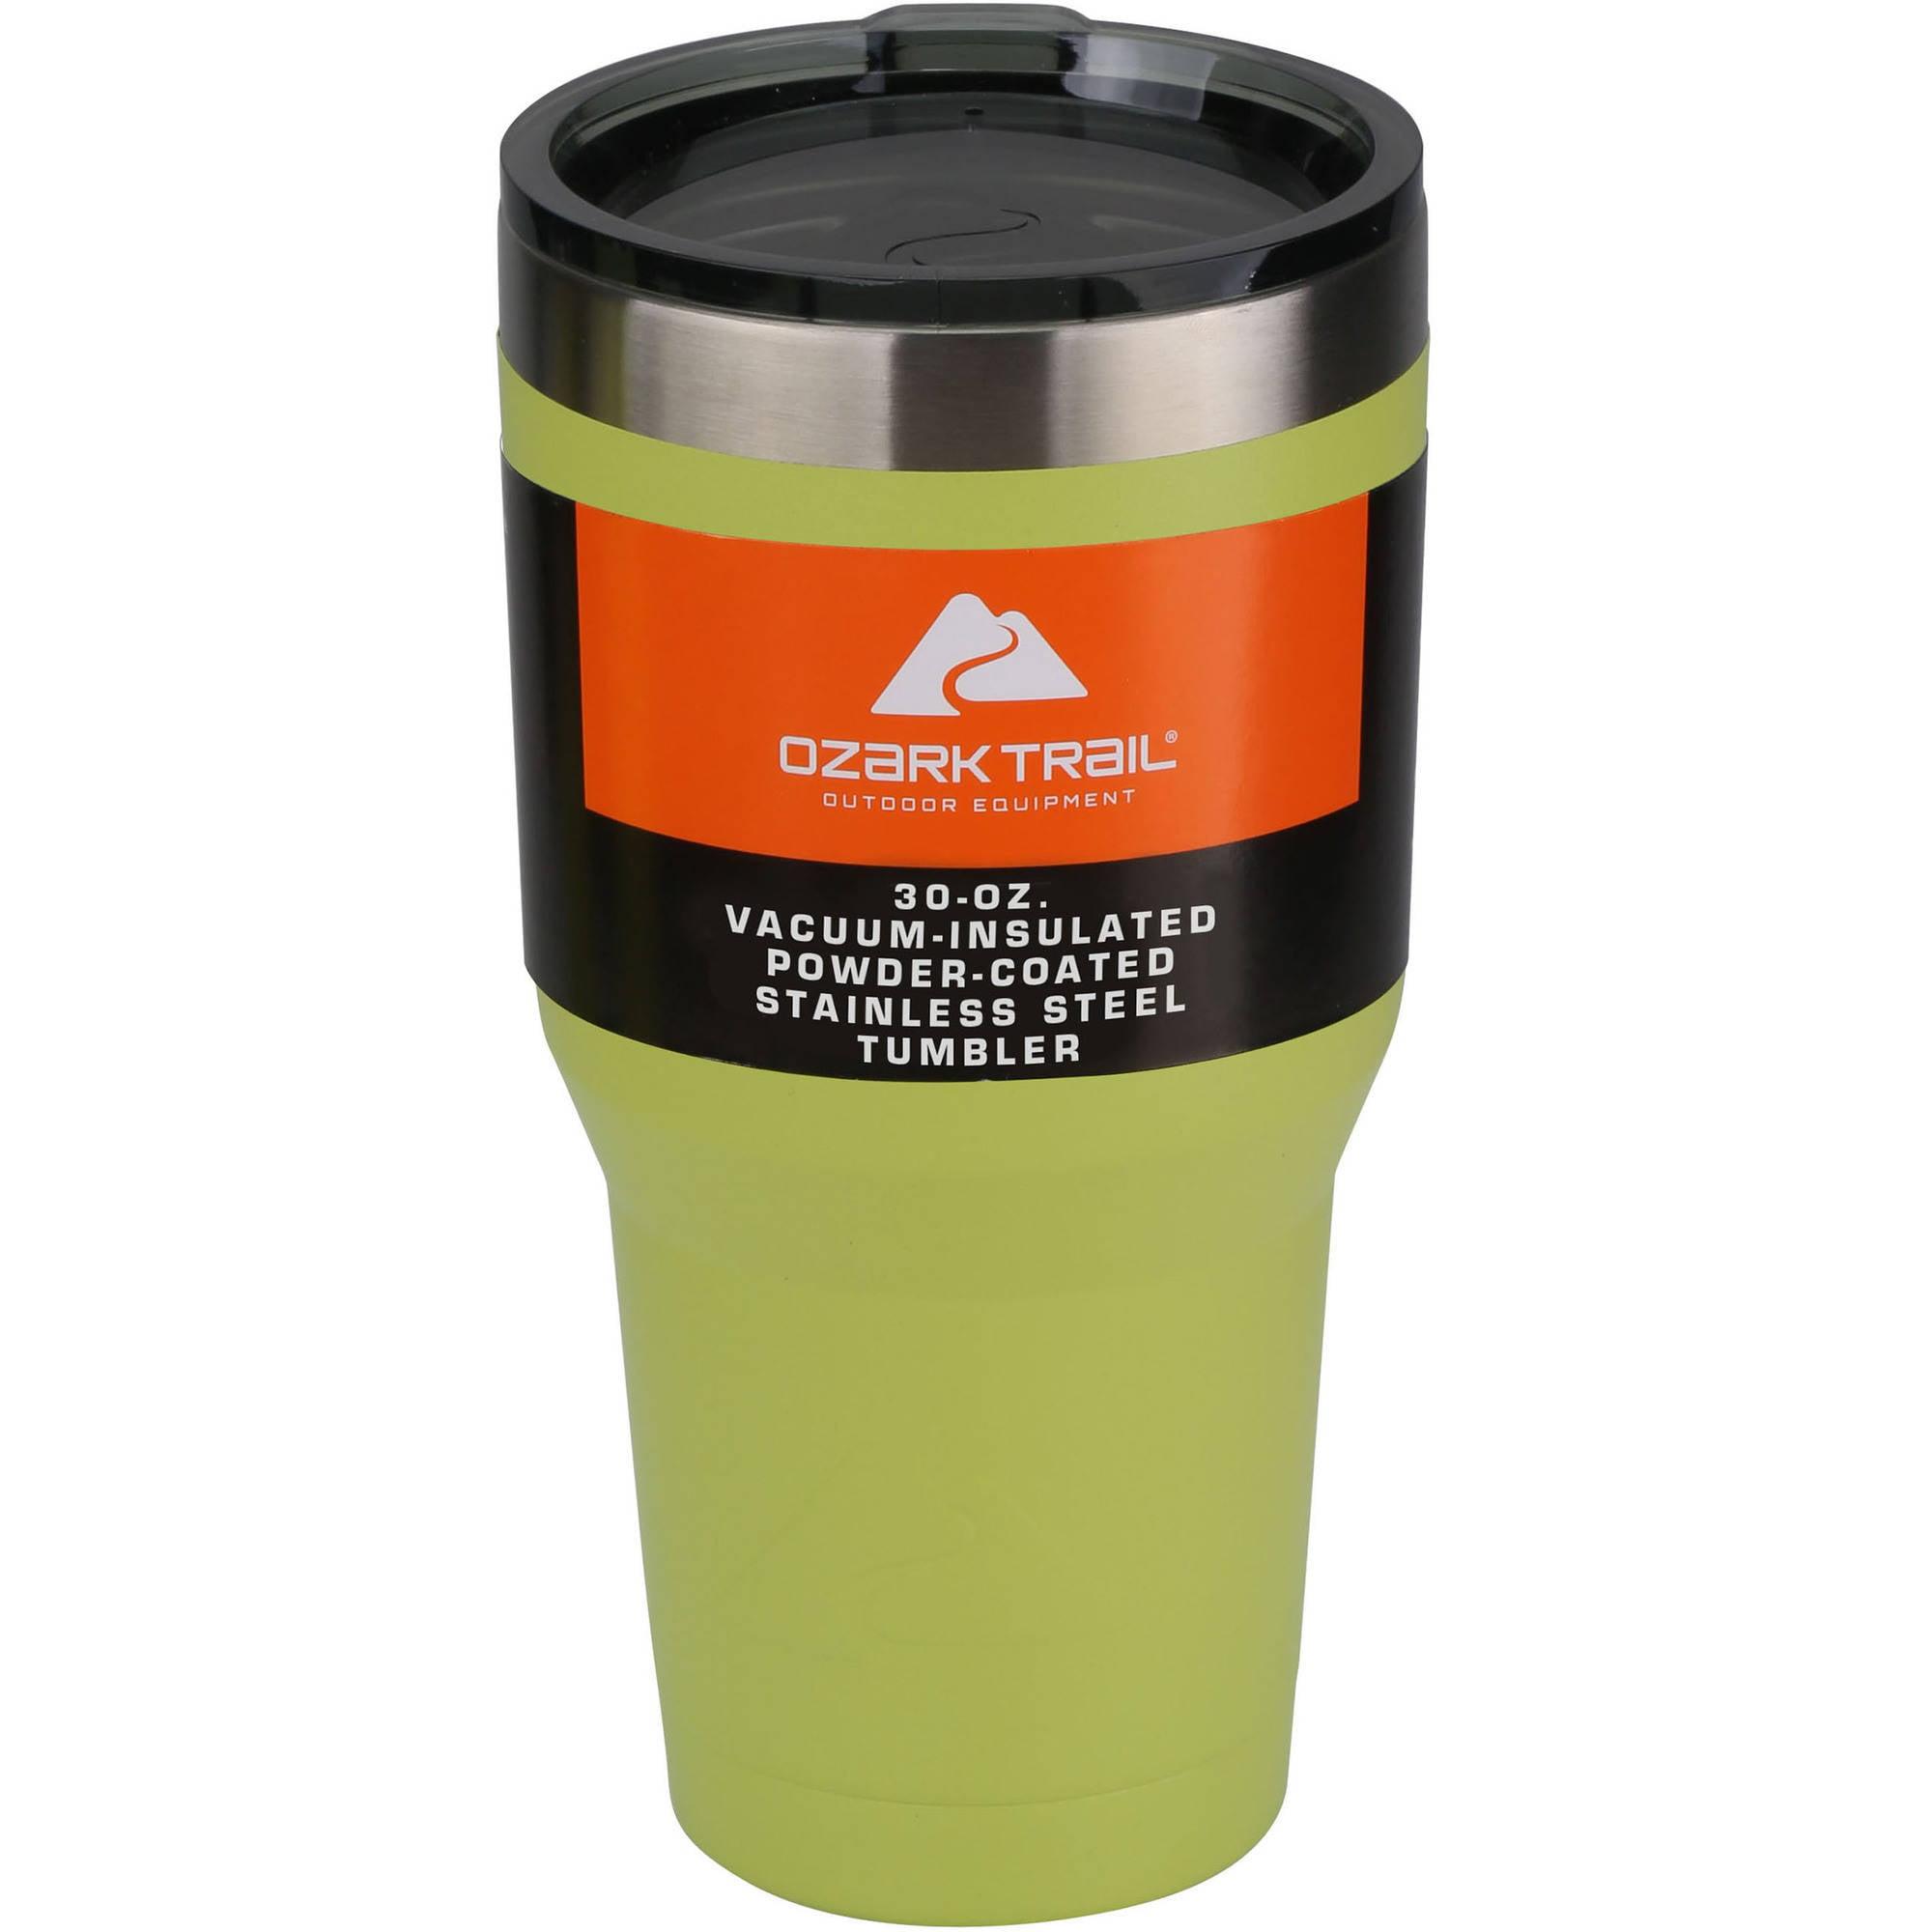 30 oz Powder-Coated Tumbler, Acid Green by OLYMPIA TOOLS INTL INC